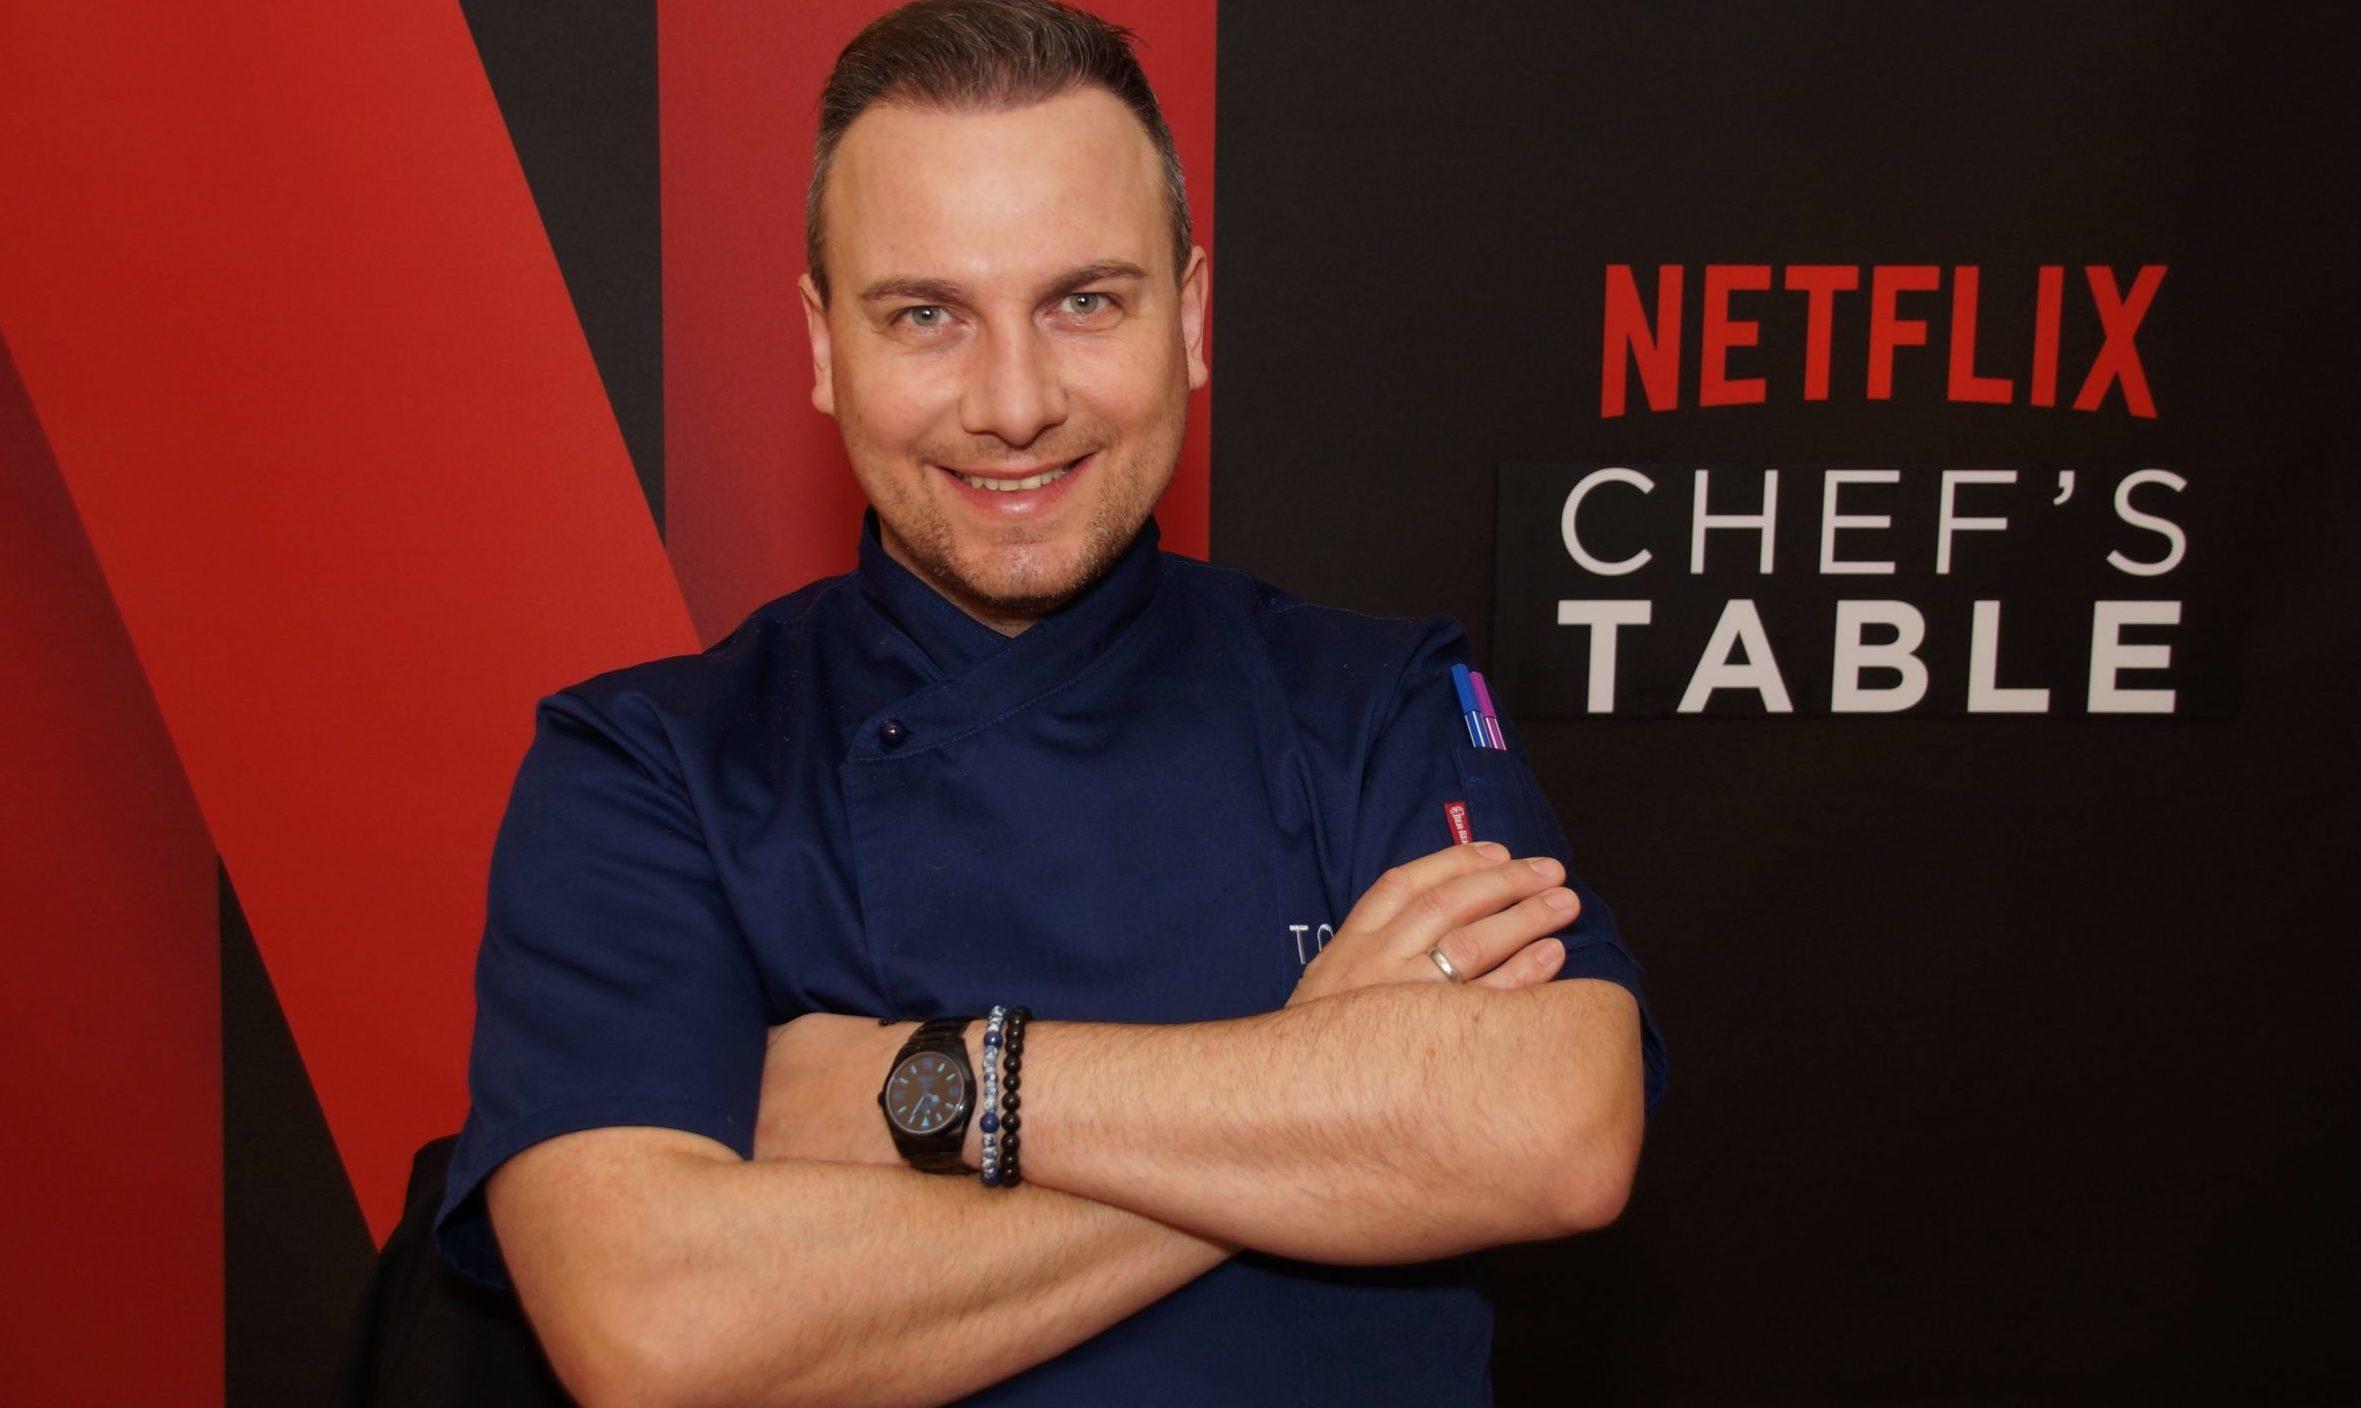 Netflix cooking shows